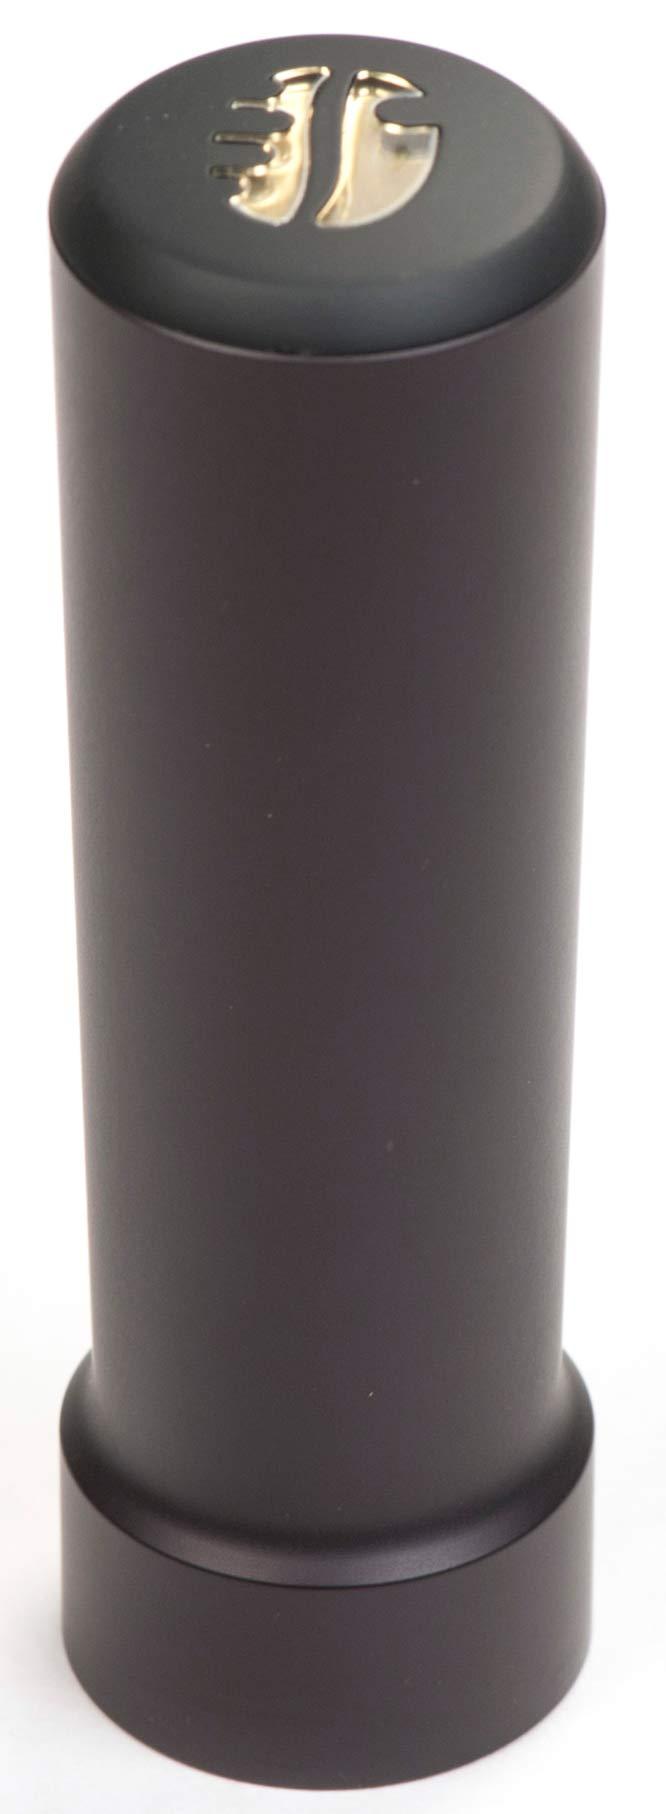 Handpresso Domepod Tamper by Handpresso